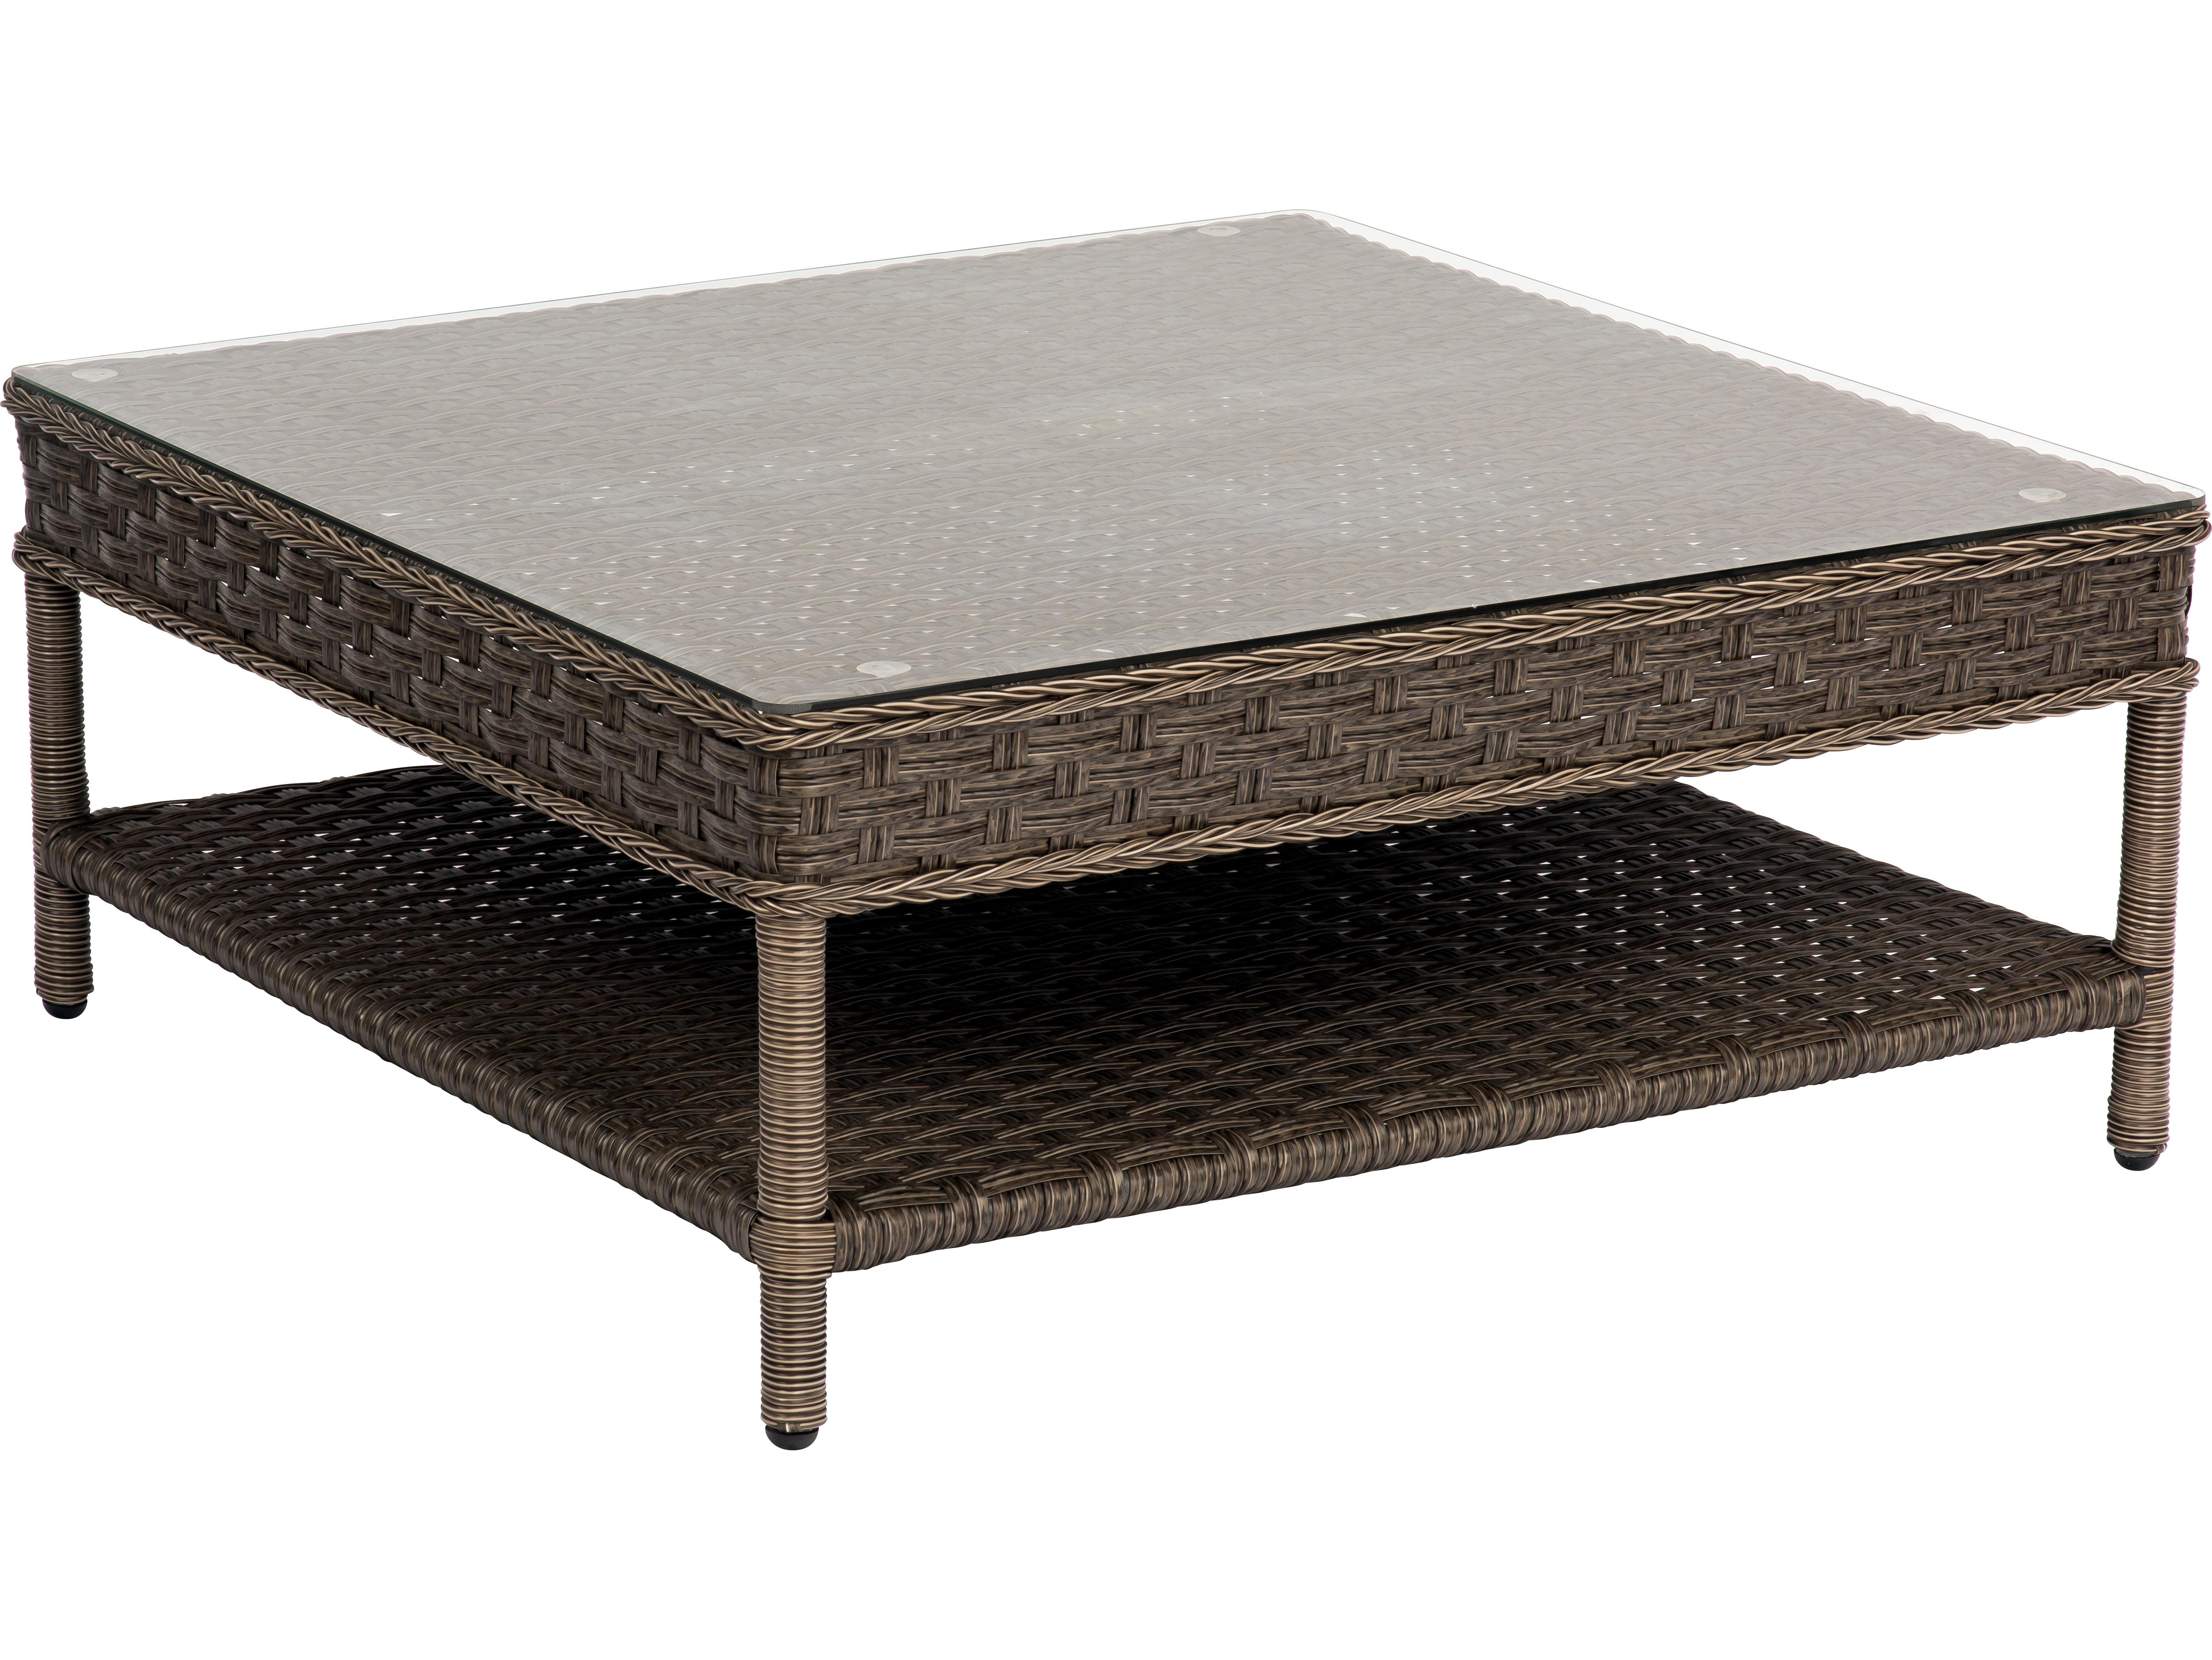 Woodard Savannah Wicker 36 Square Glass Top Coffee Table